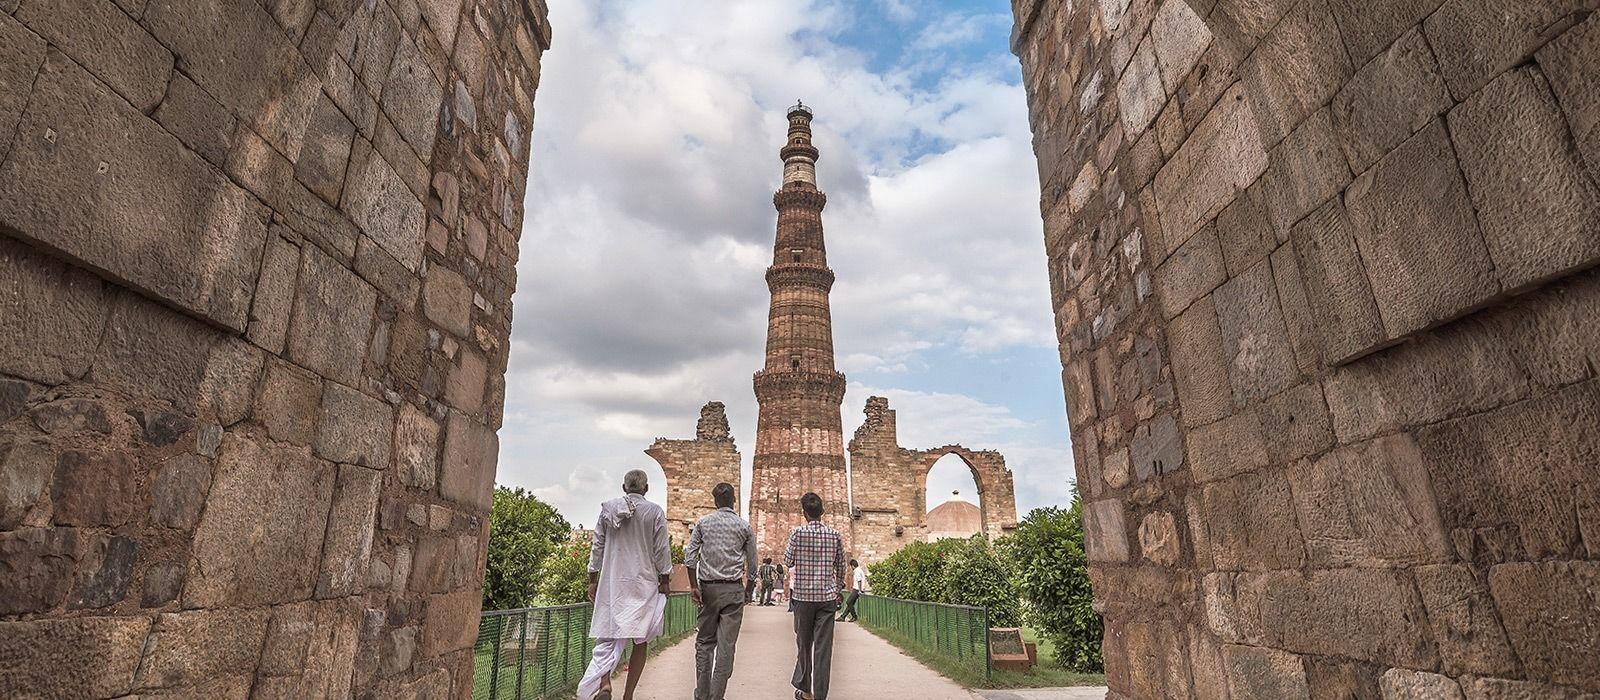 Regal and Spiritual North India Tour Trip 6